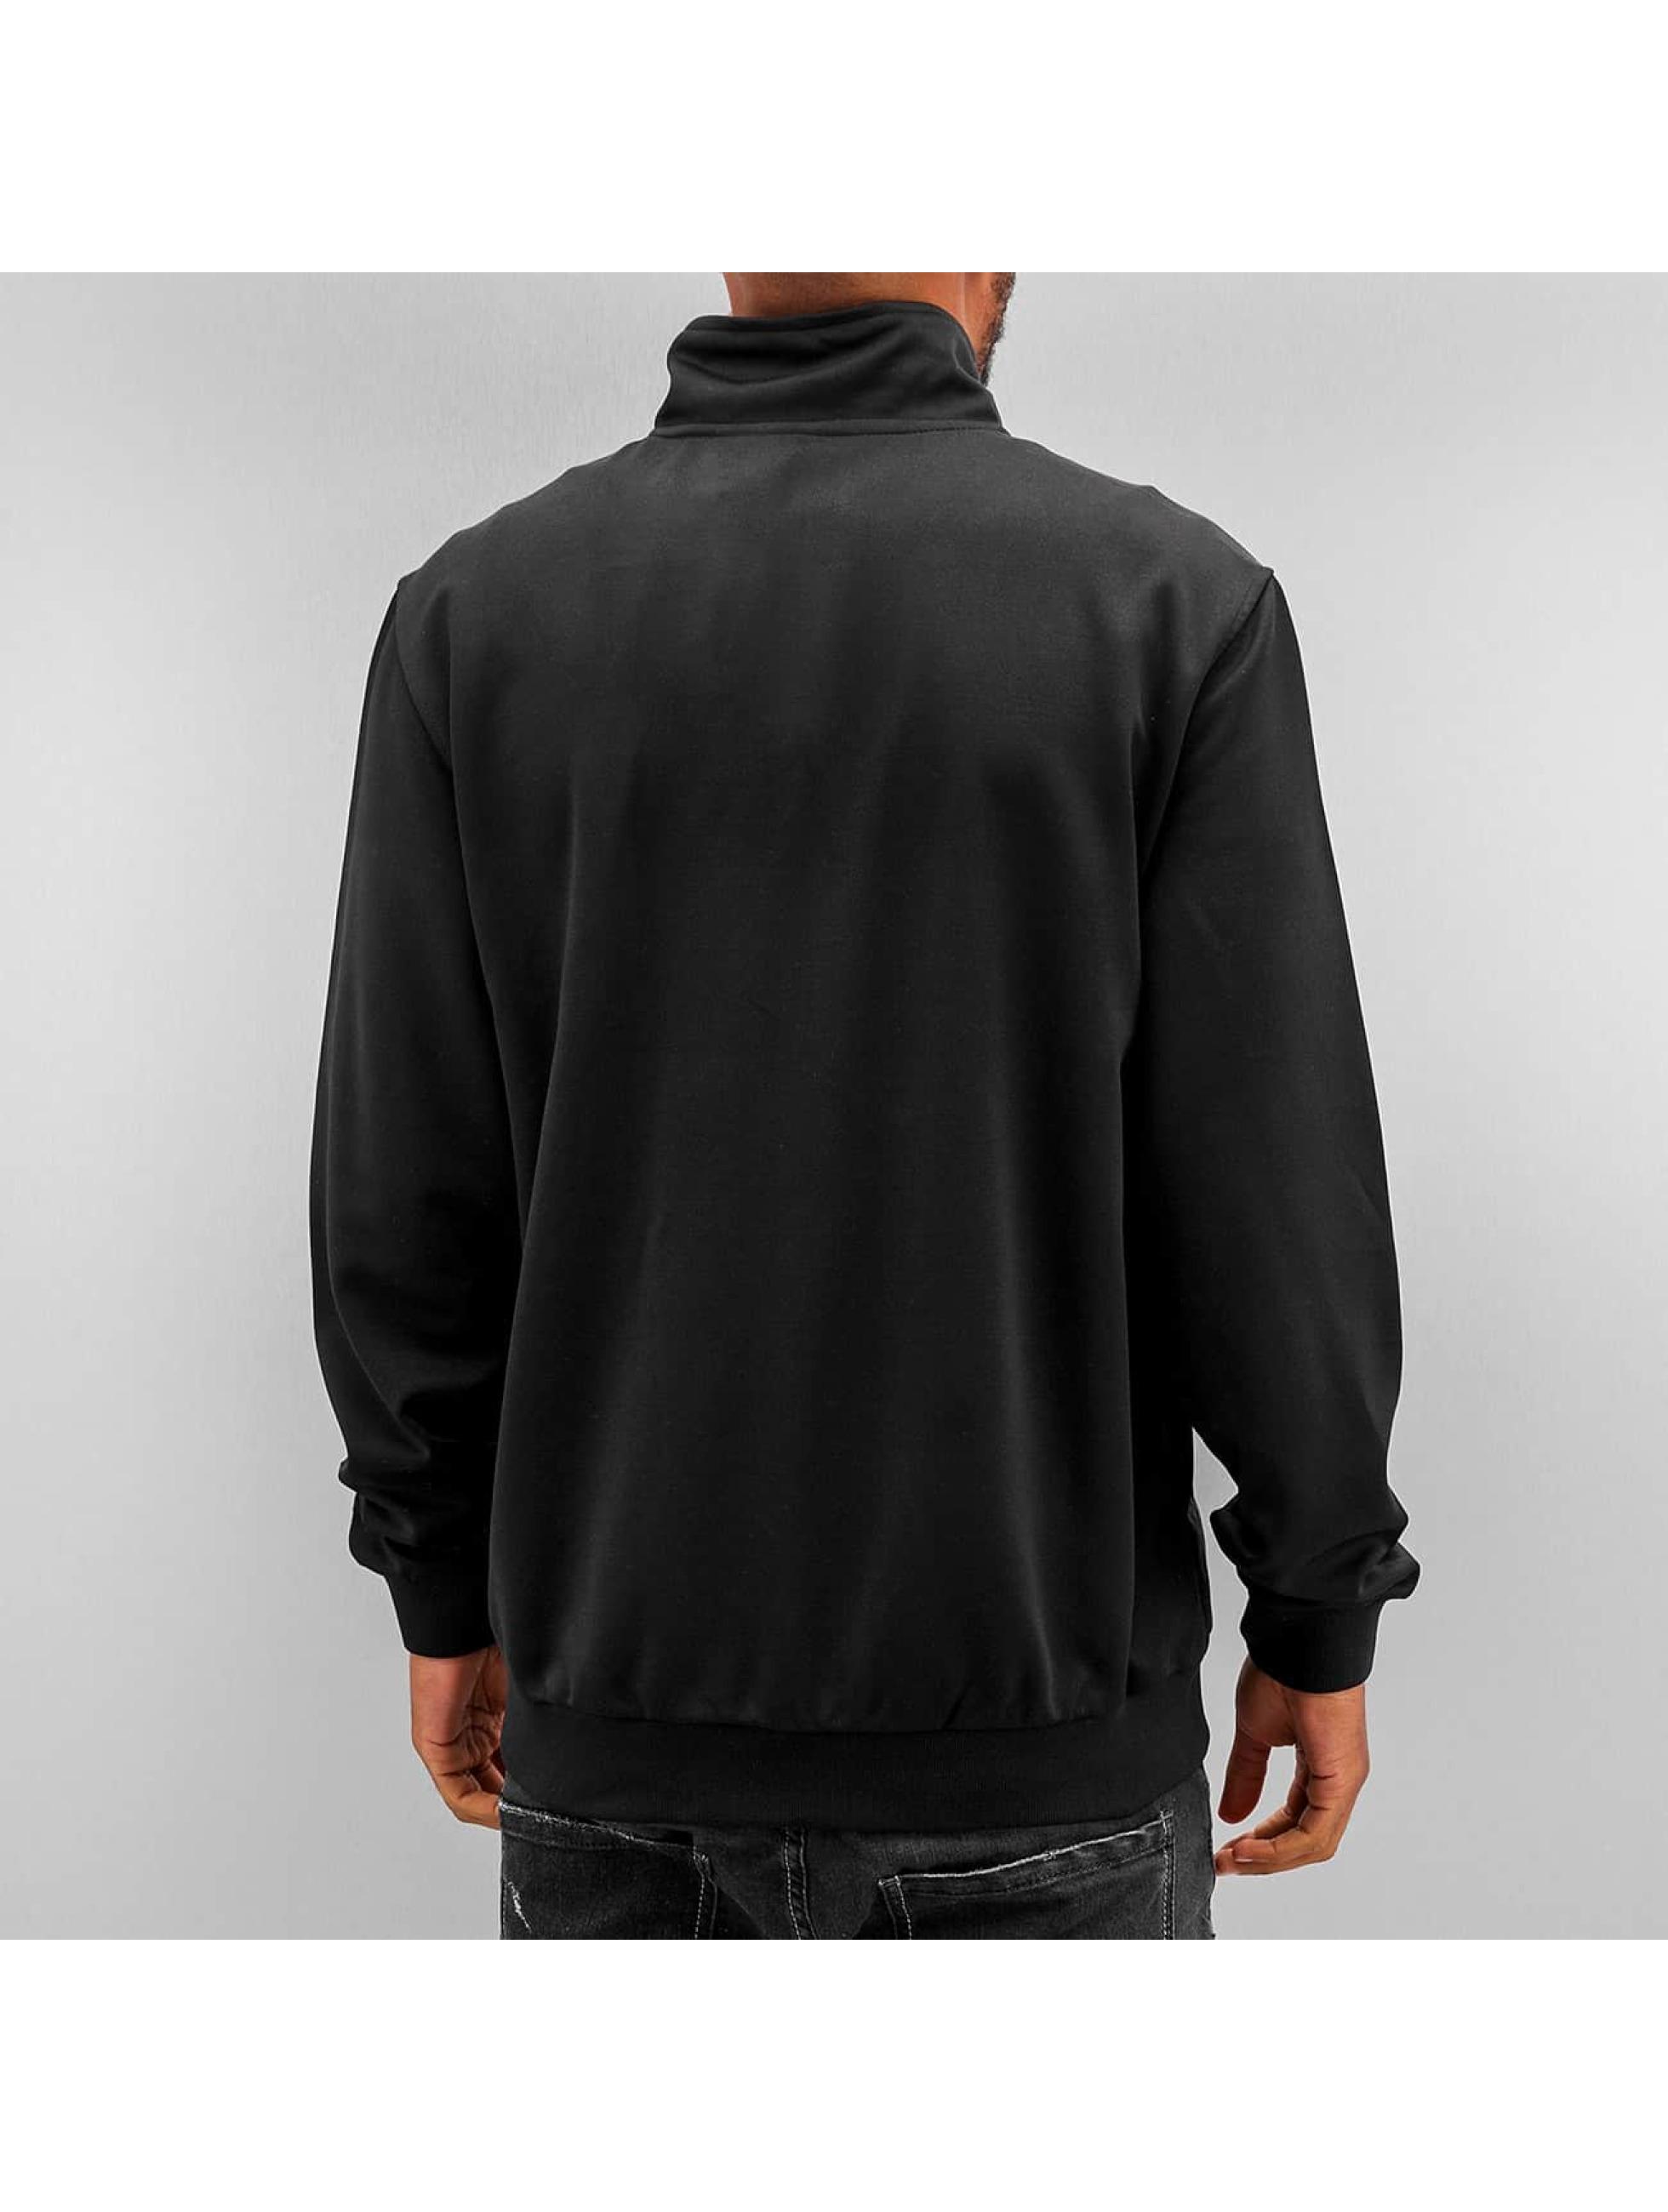 Pelle Pelle Демисезонная куртка Icon Plate черный